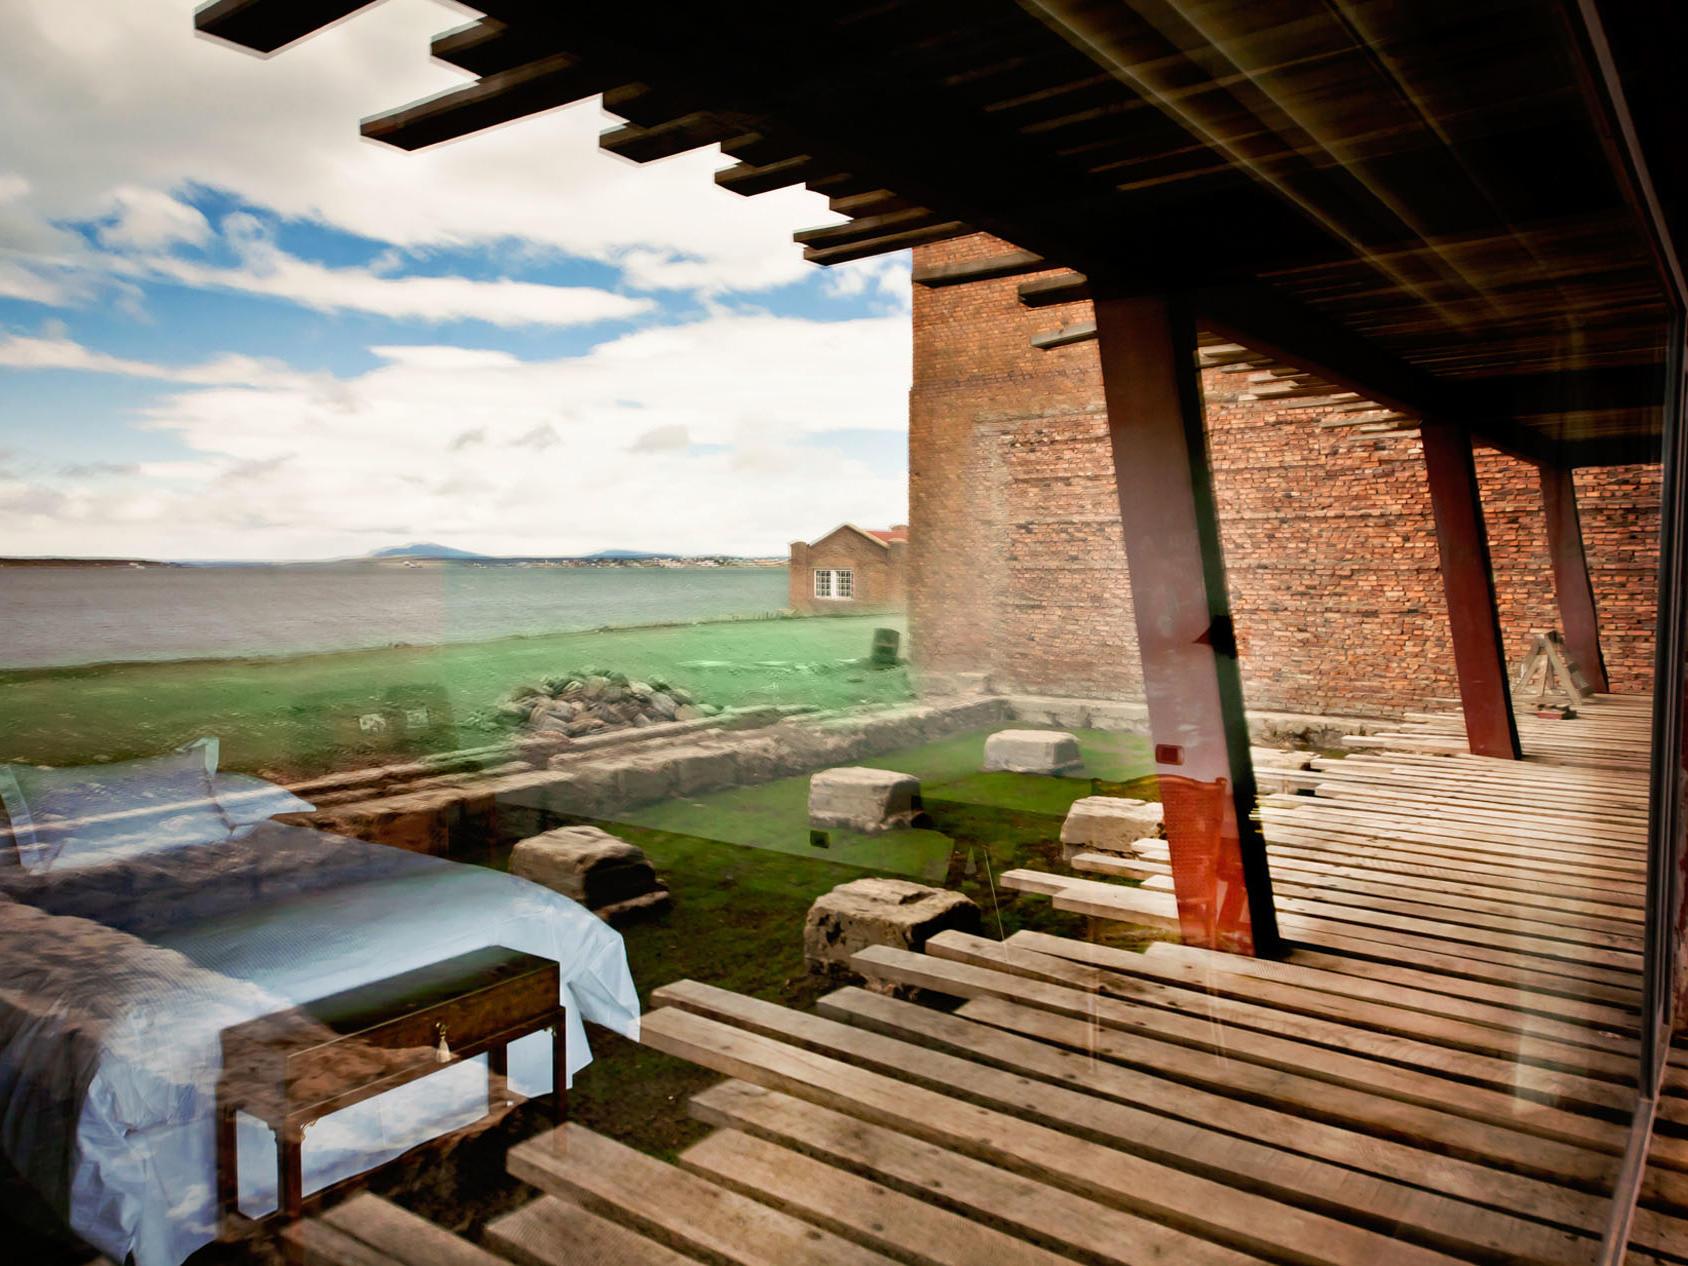 Estadias Patagonia chilena